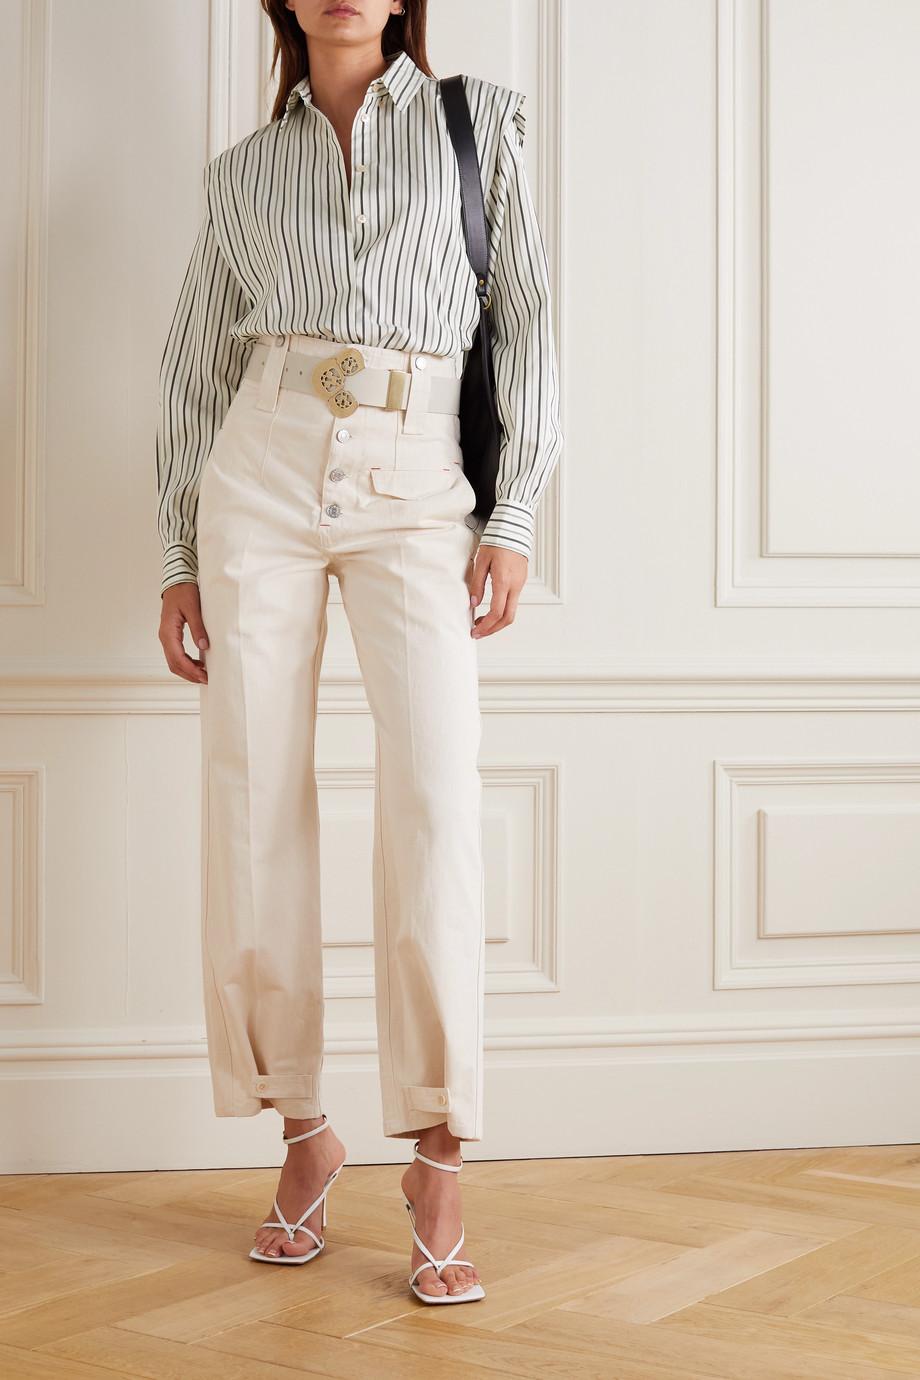 Isabel Marant Sotalki striped silk shirt